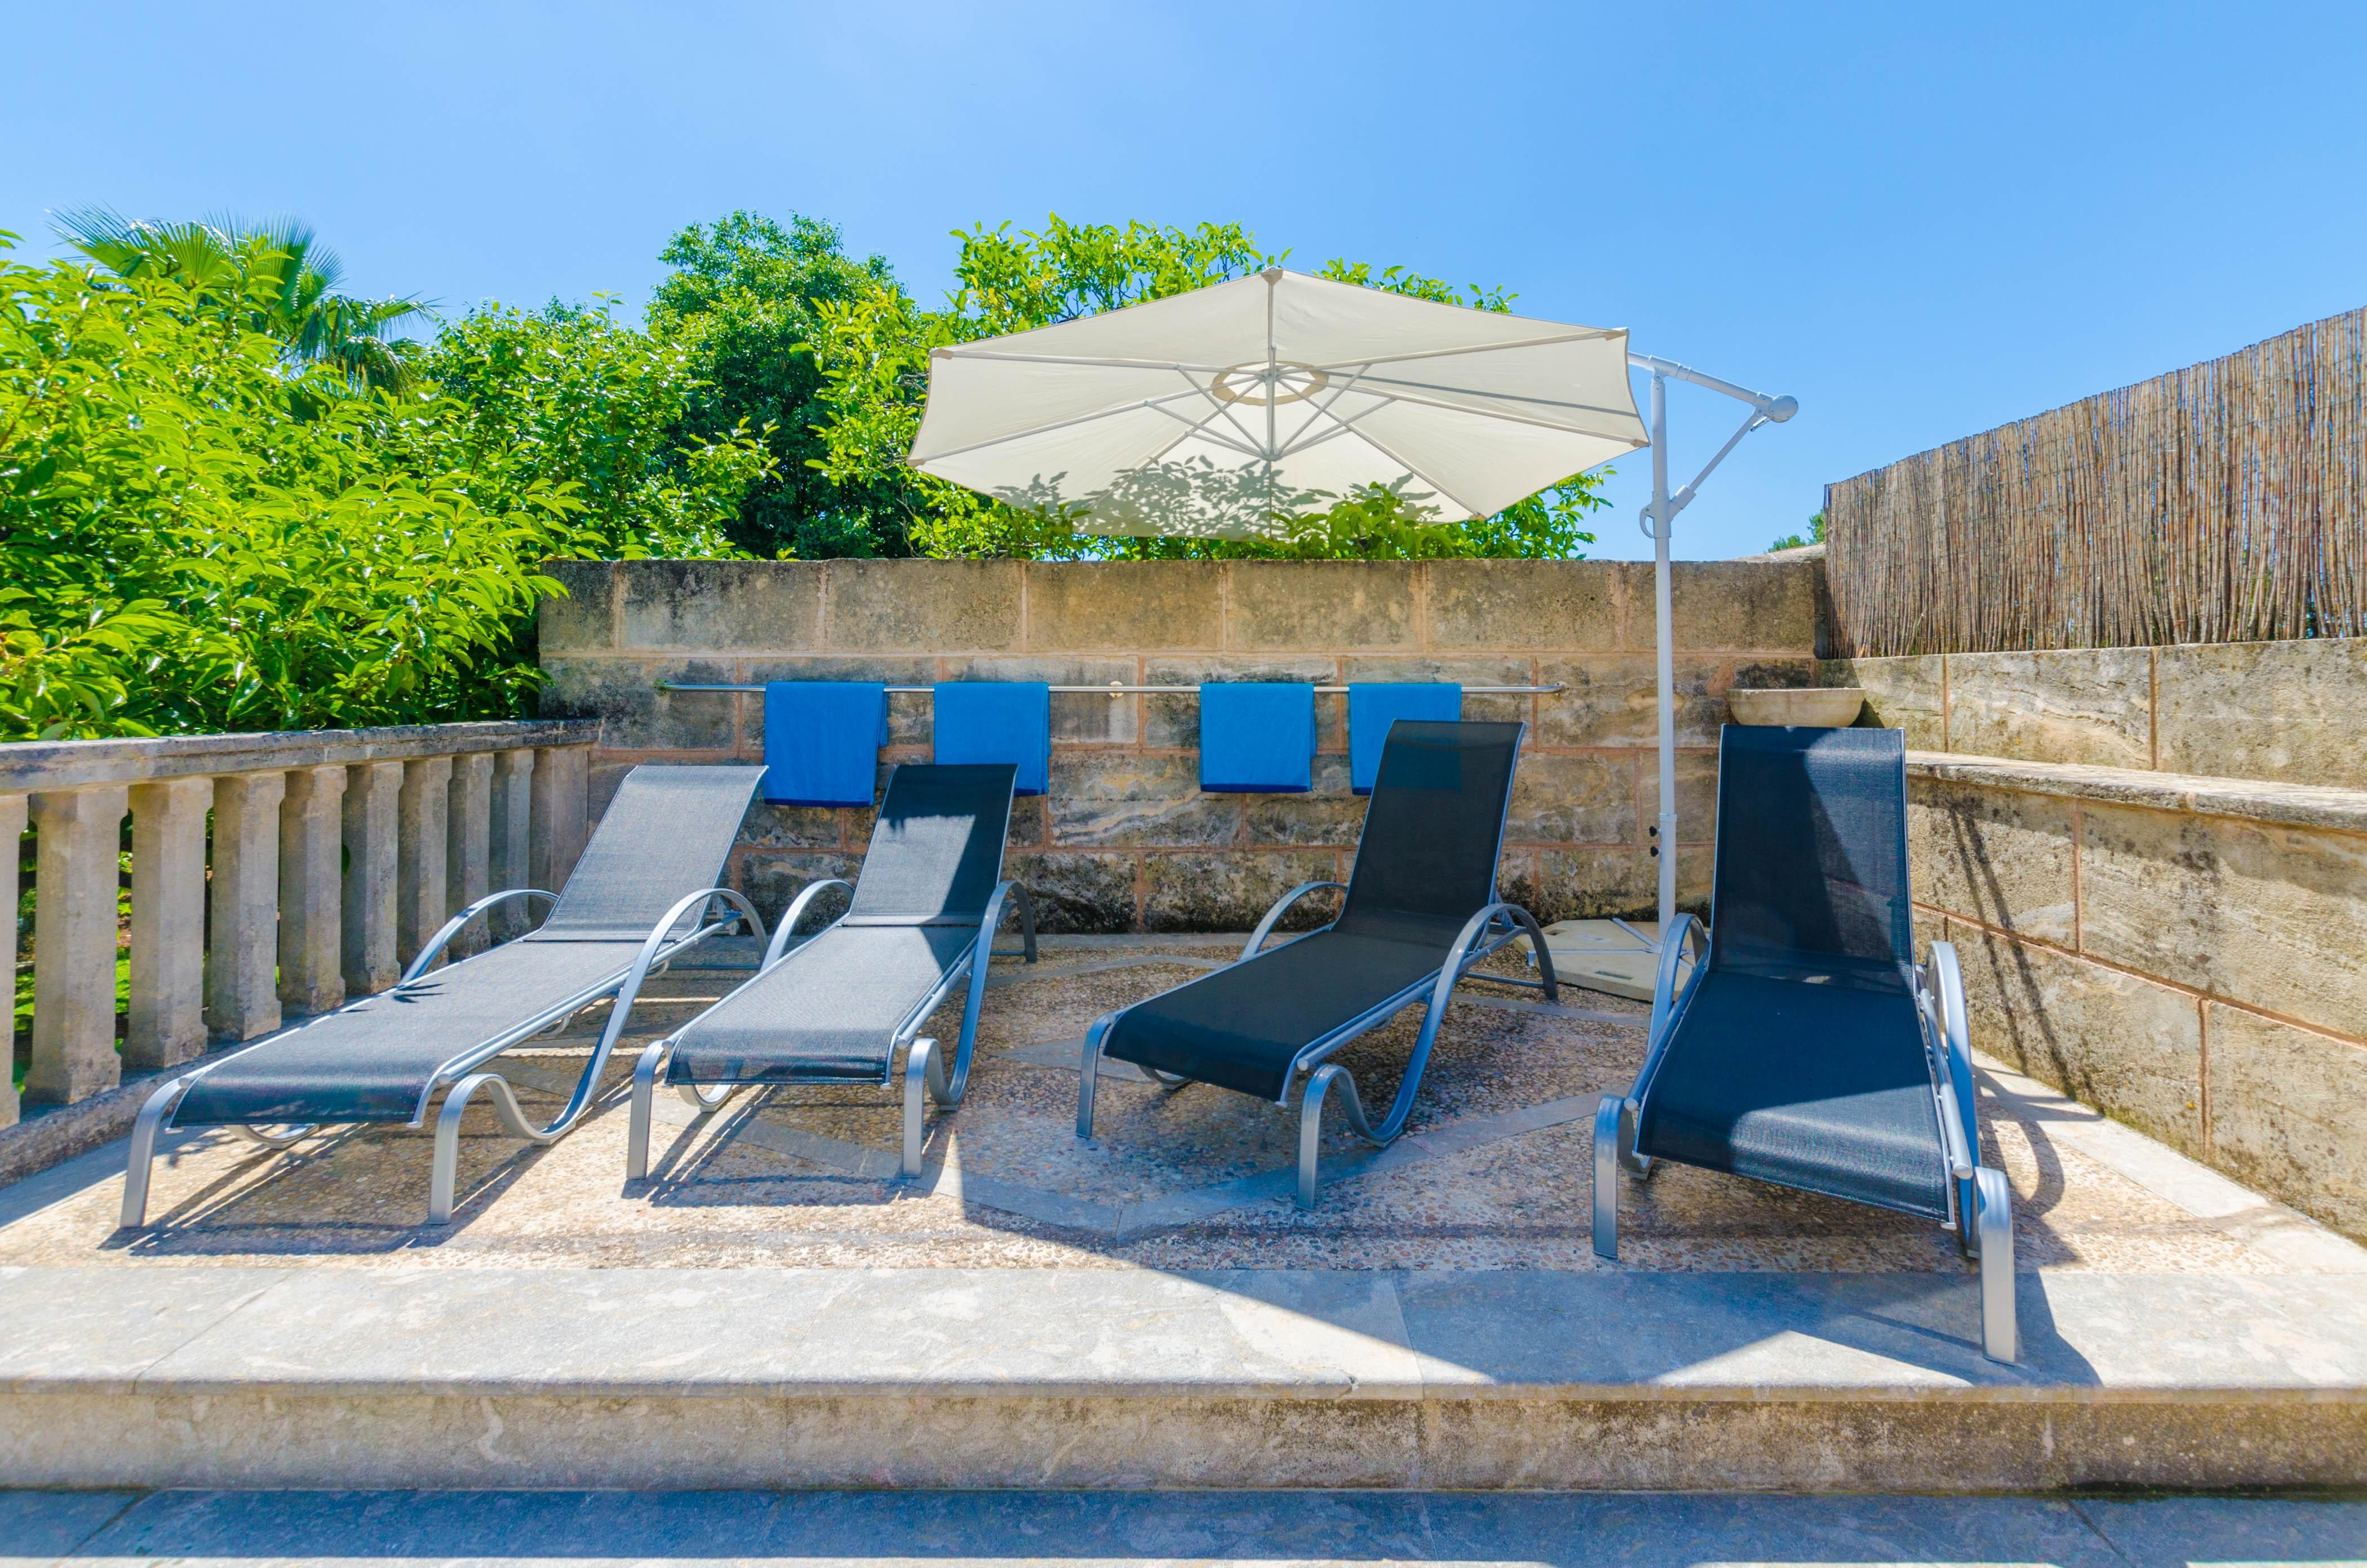 Maison de vacances CAS CONVIDATS (2435013), Alaro, Majorque, Iles Baléares, Espagne, image 6